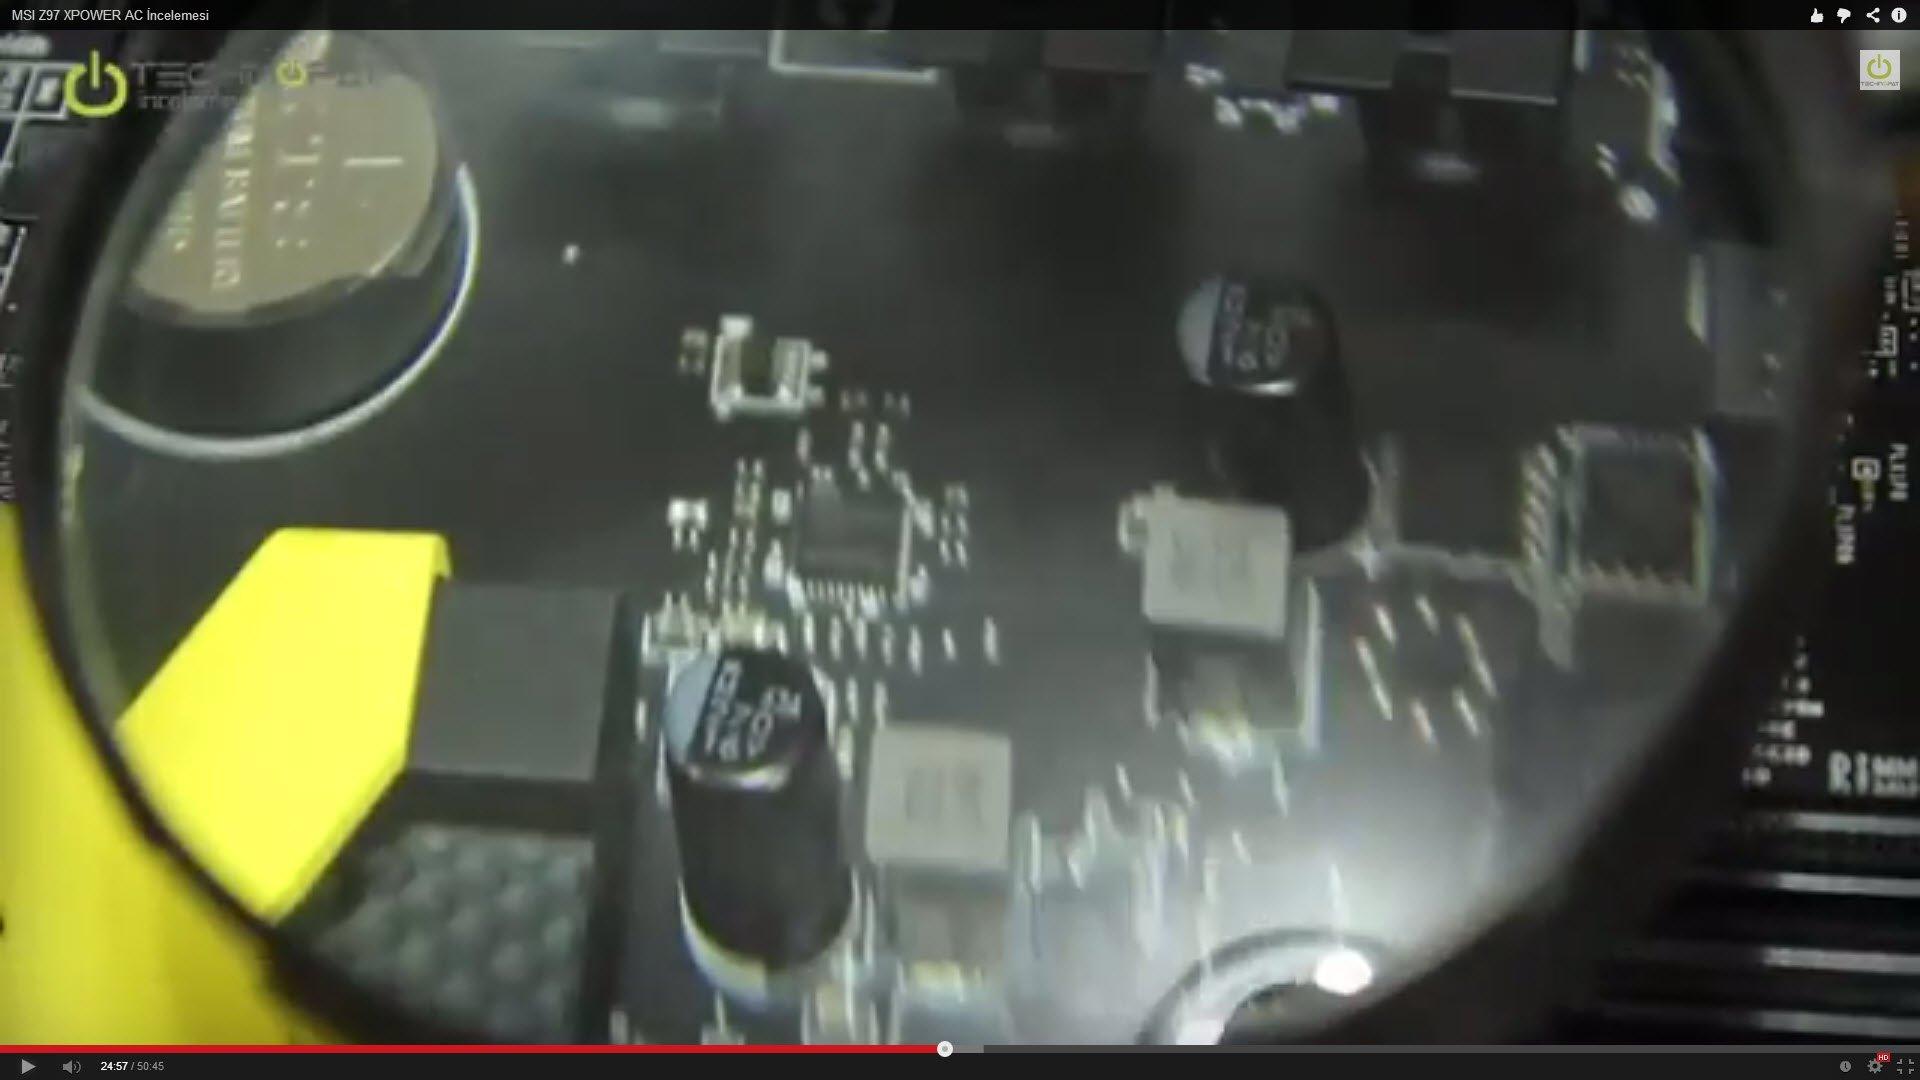 msi-z97-xpower-ac-anakart-inceleme-technopat-3